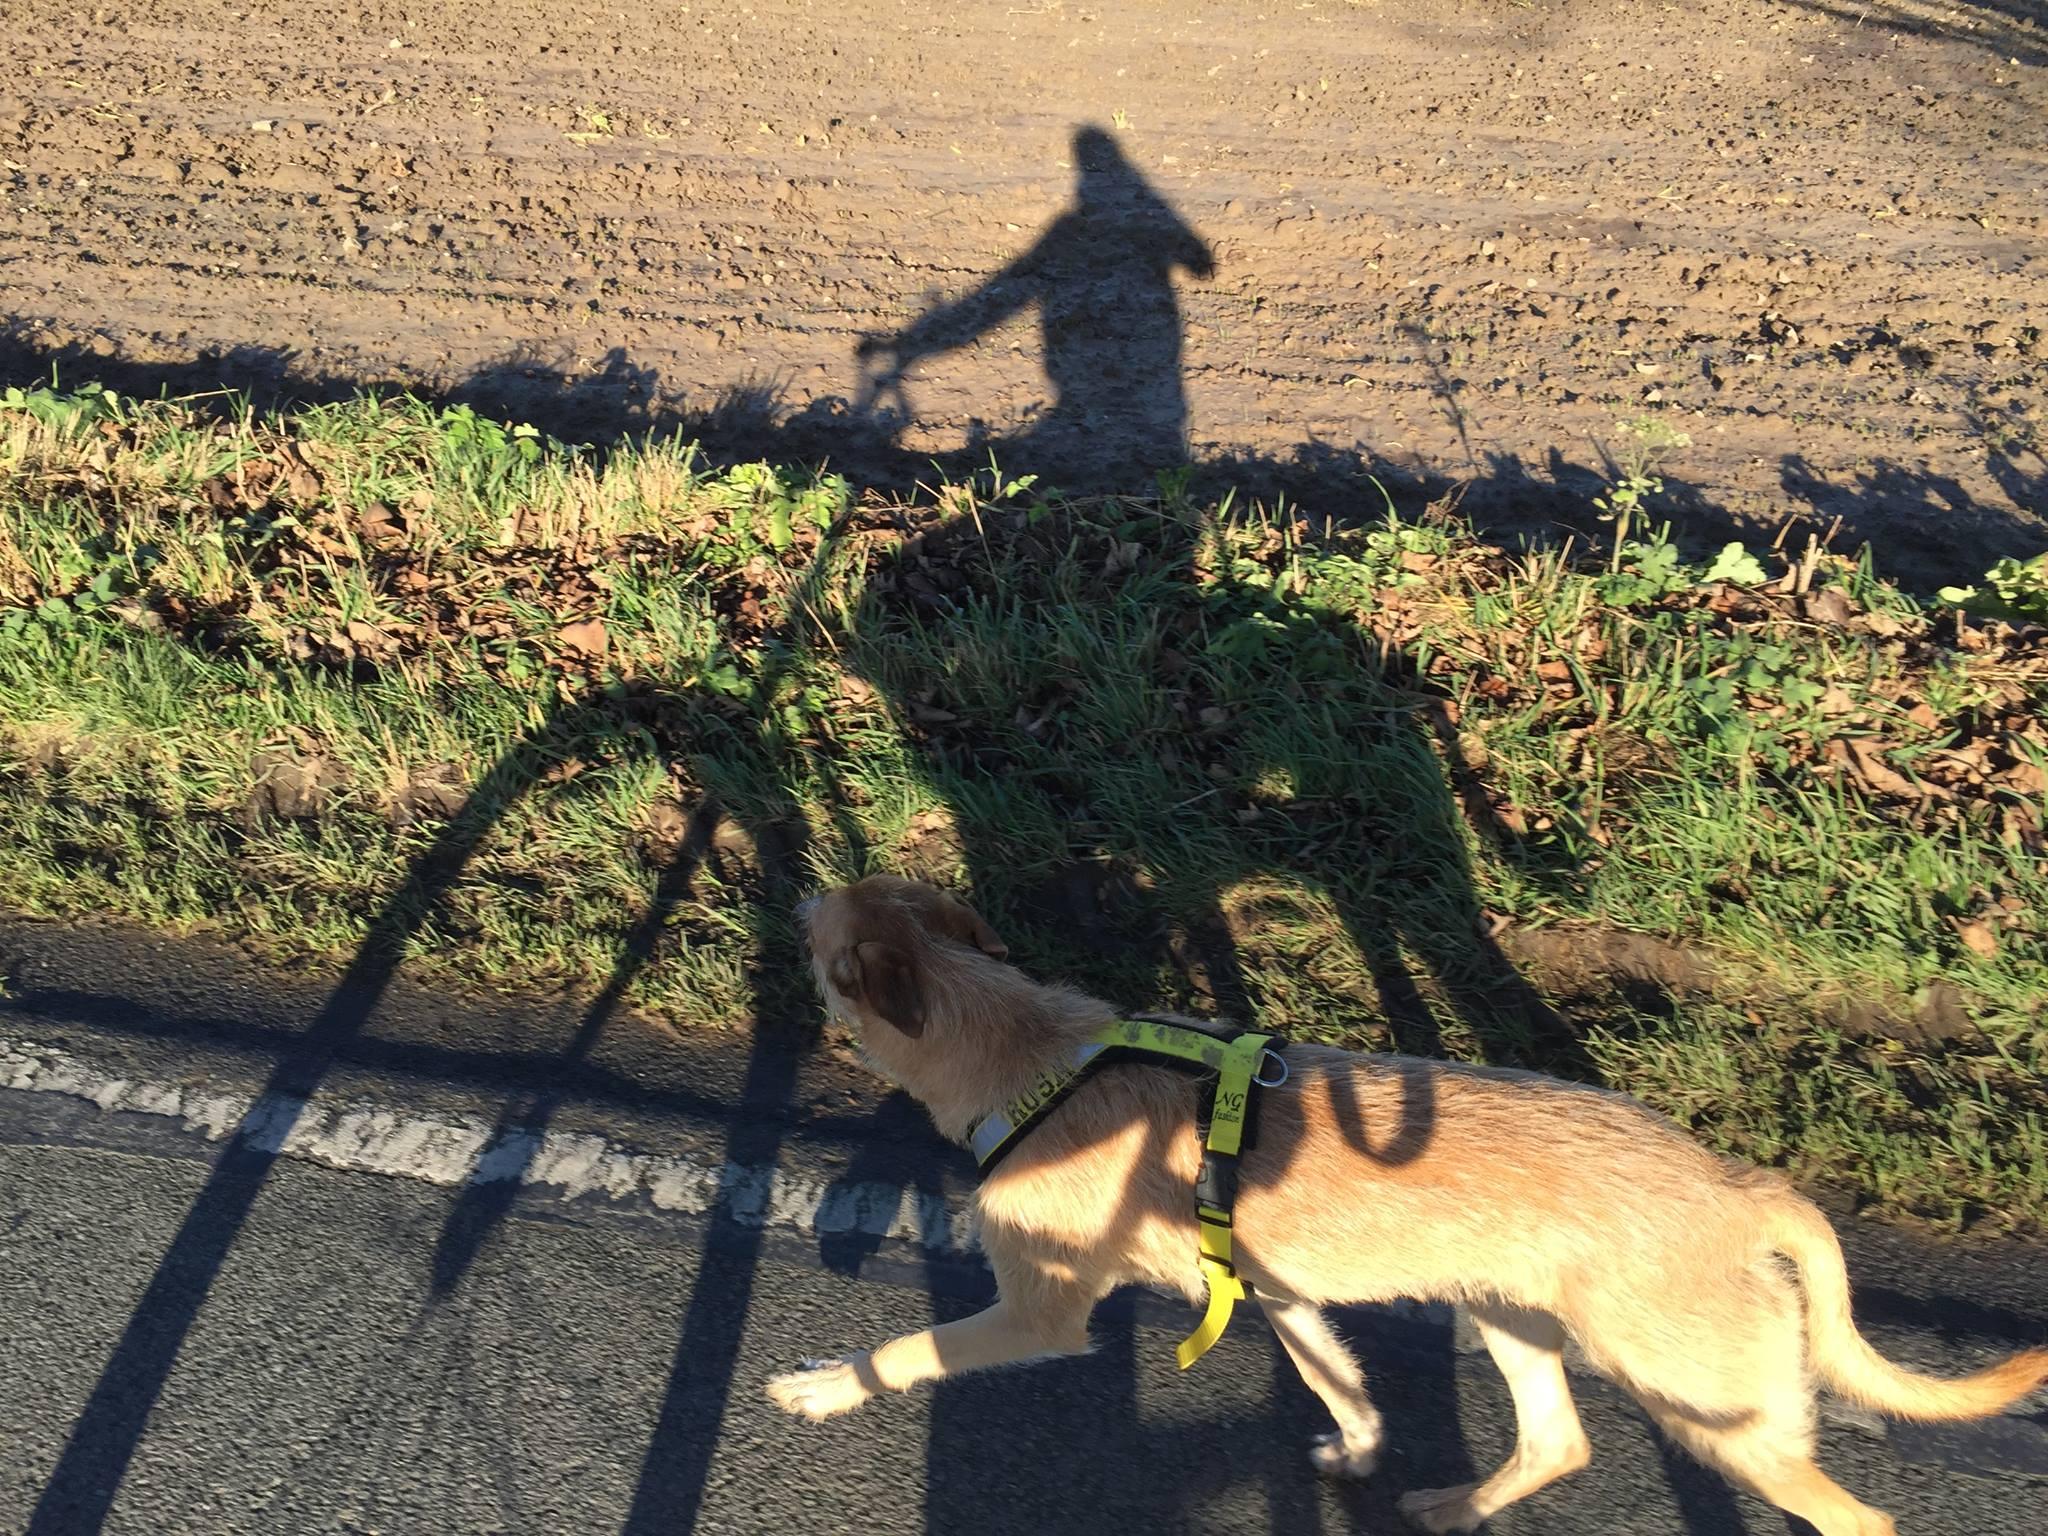 Hund läuft am Fahrrad Fahrradtour mit Hund